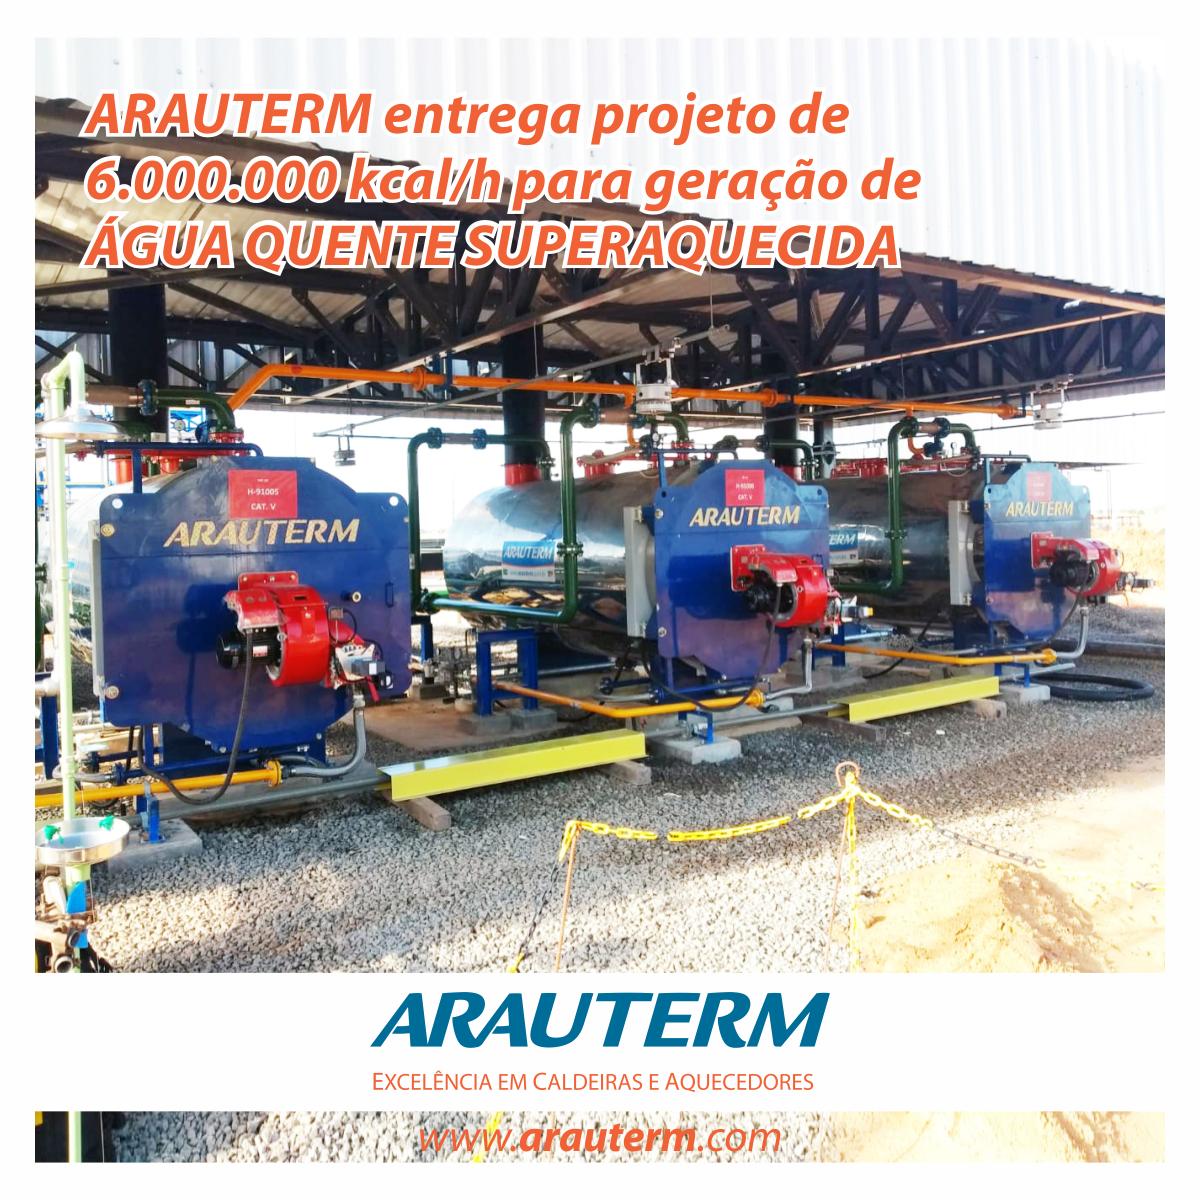 ARAUTERM entrega projeto de 6.000.000 kcal/h - água quente superaquecida